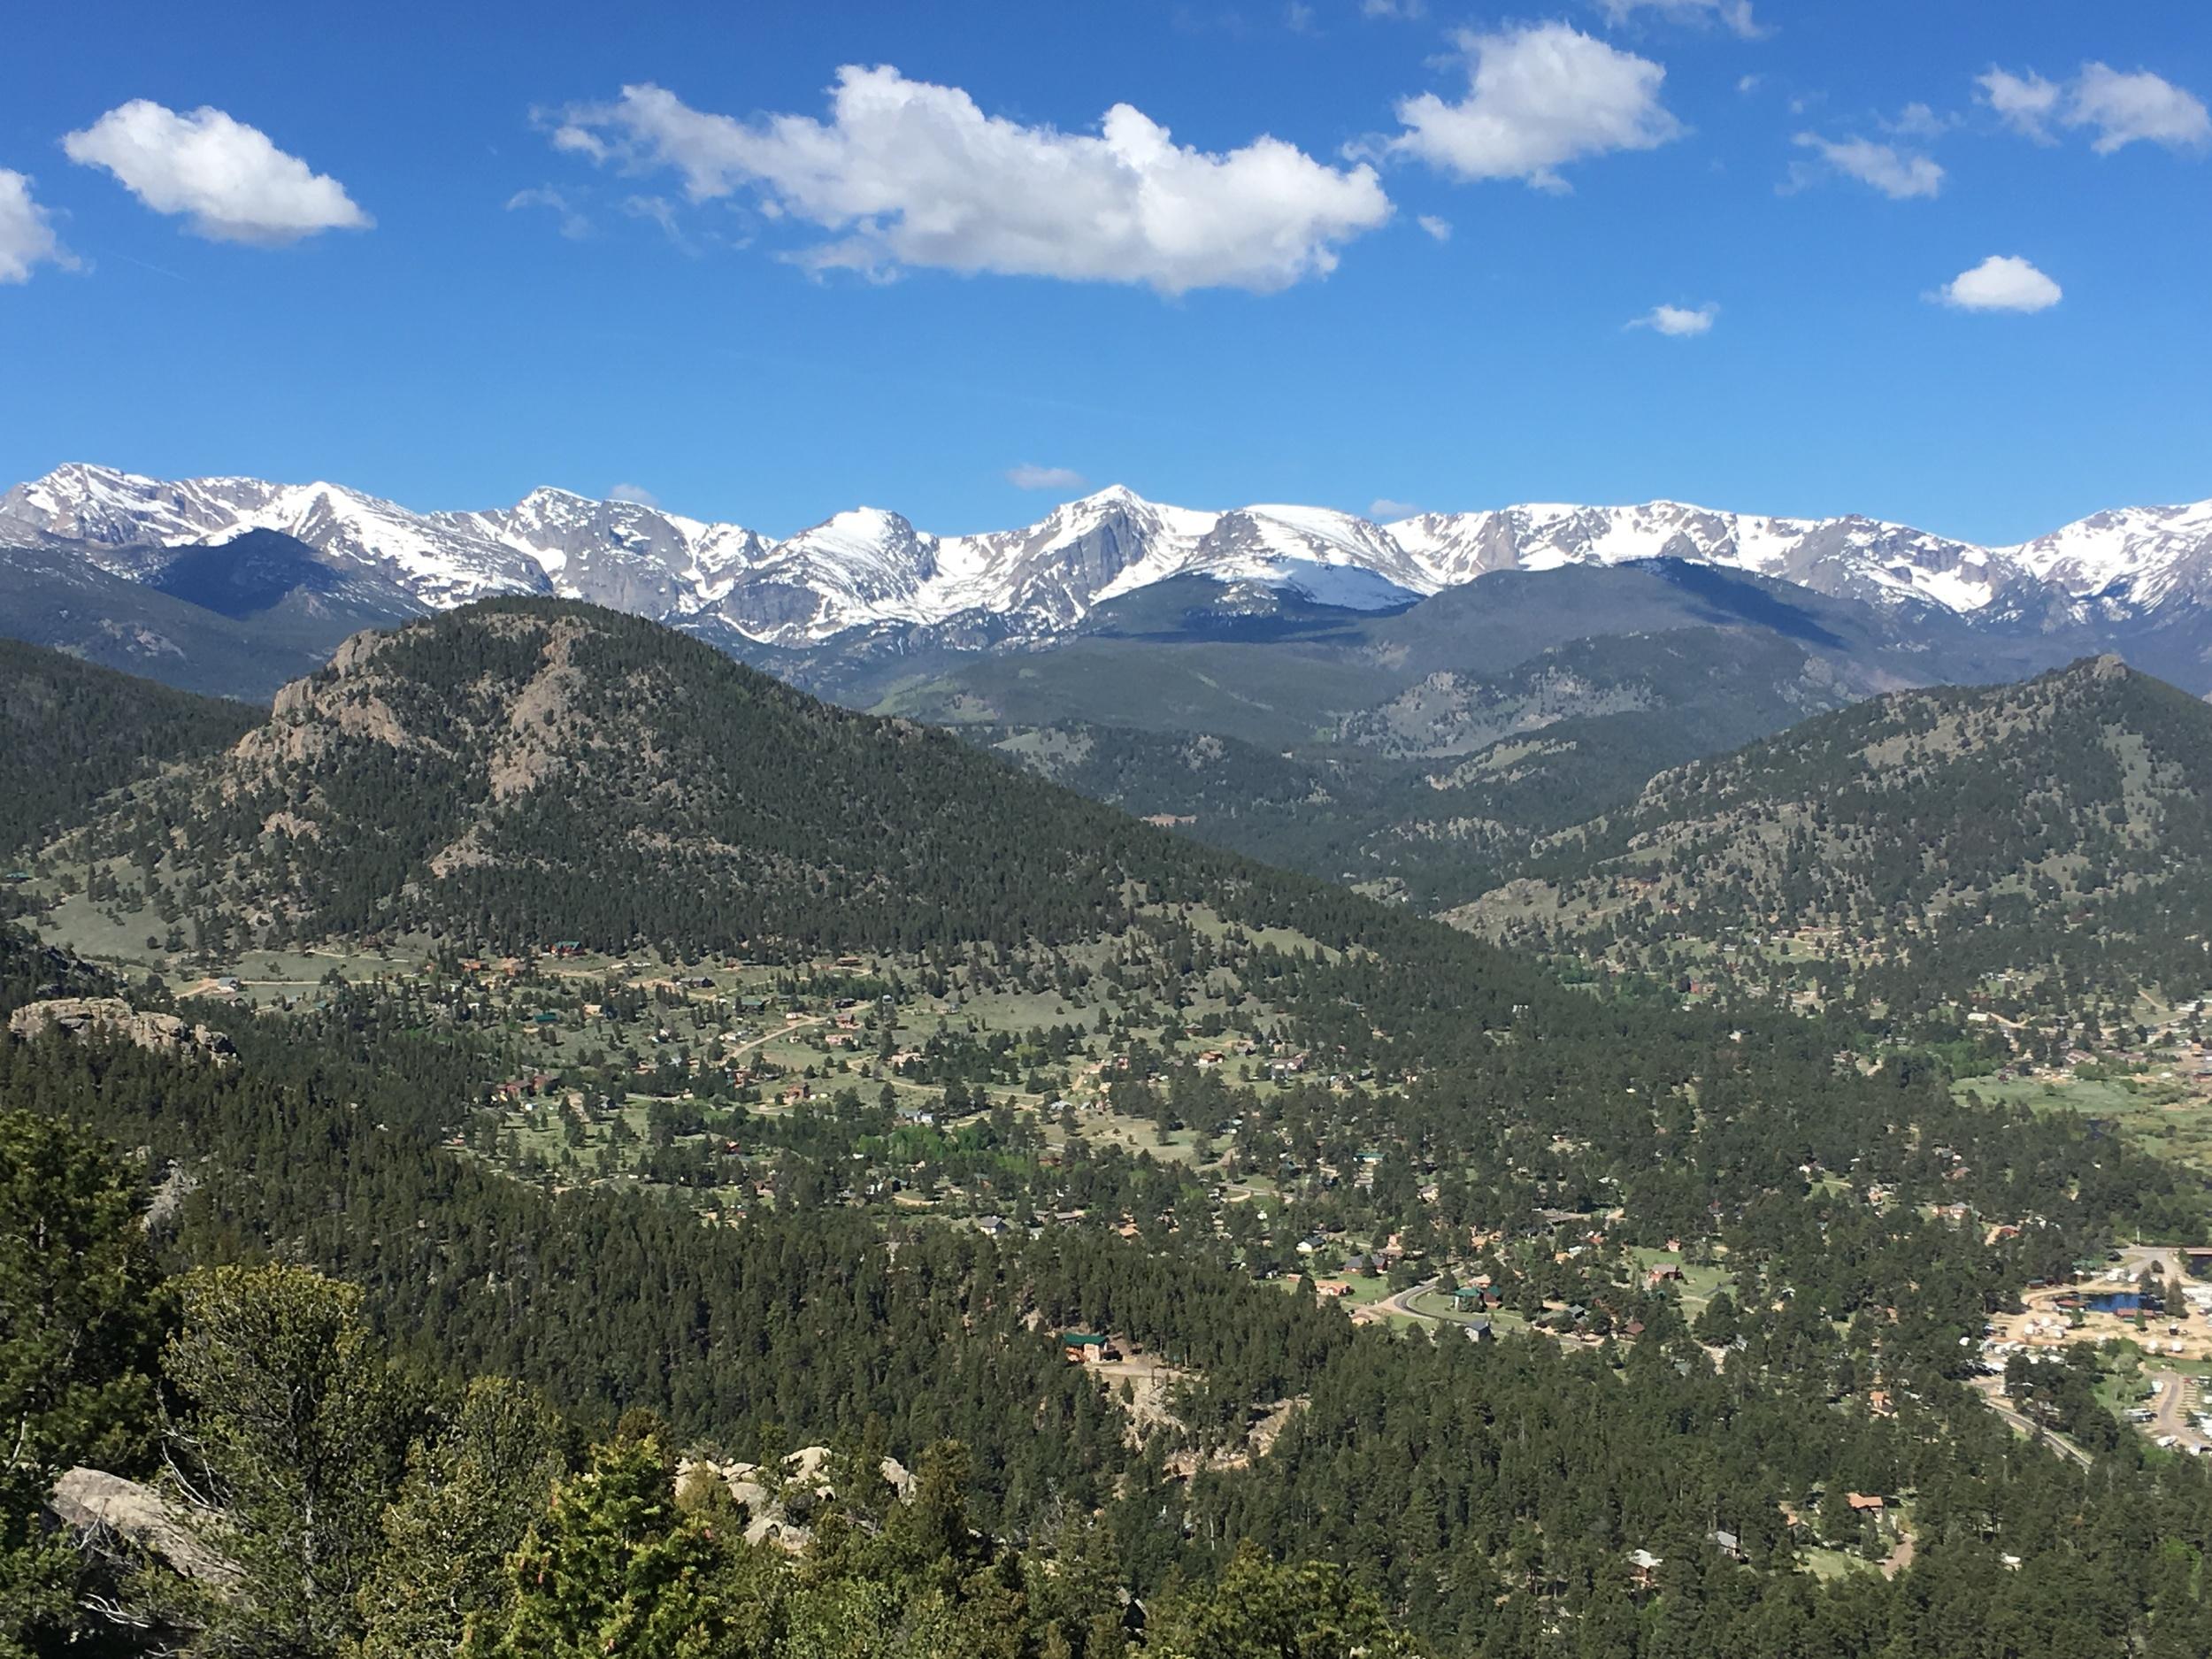 A view of Rocky Mountain National Park from Estes Park, Colorado.